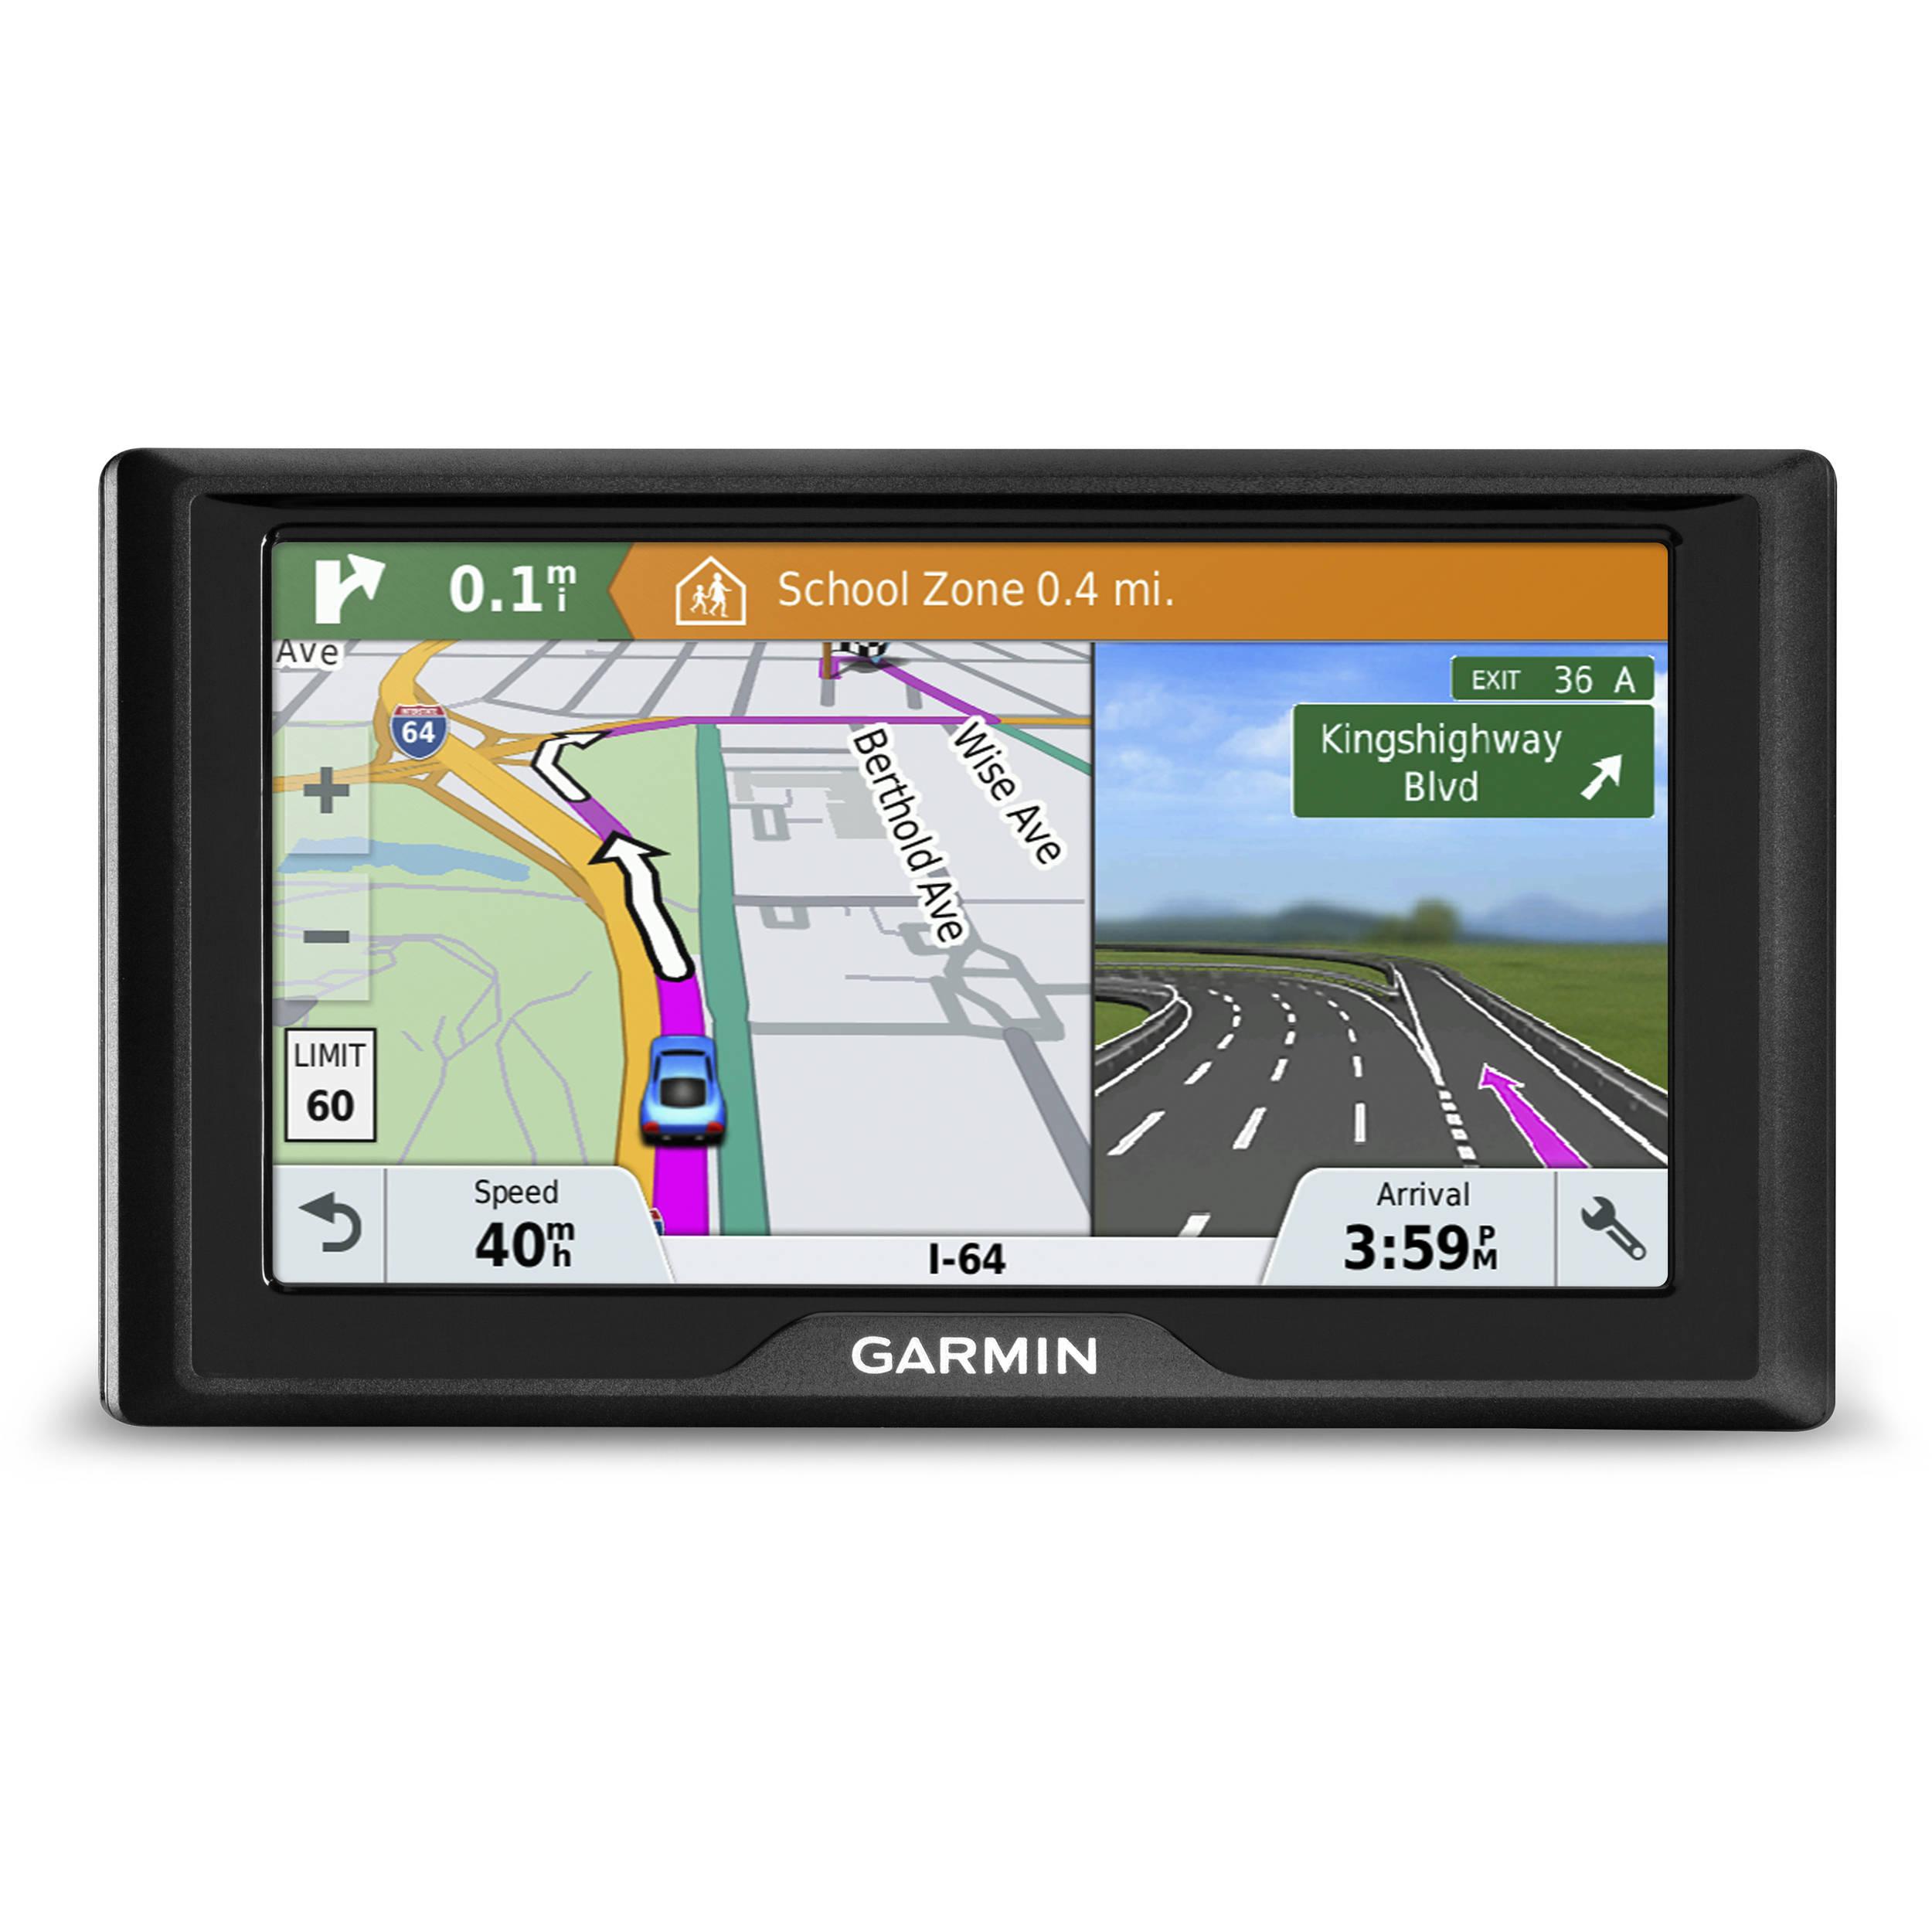 Canada Map Garmin Garmin Drive 61 LM Navigation System 010 01679 06 B&H Photo Video